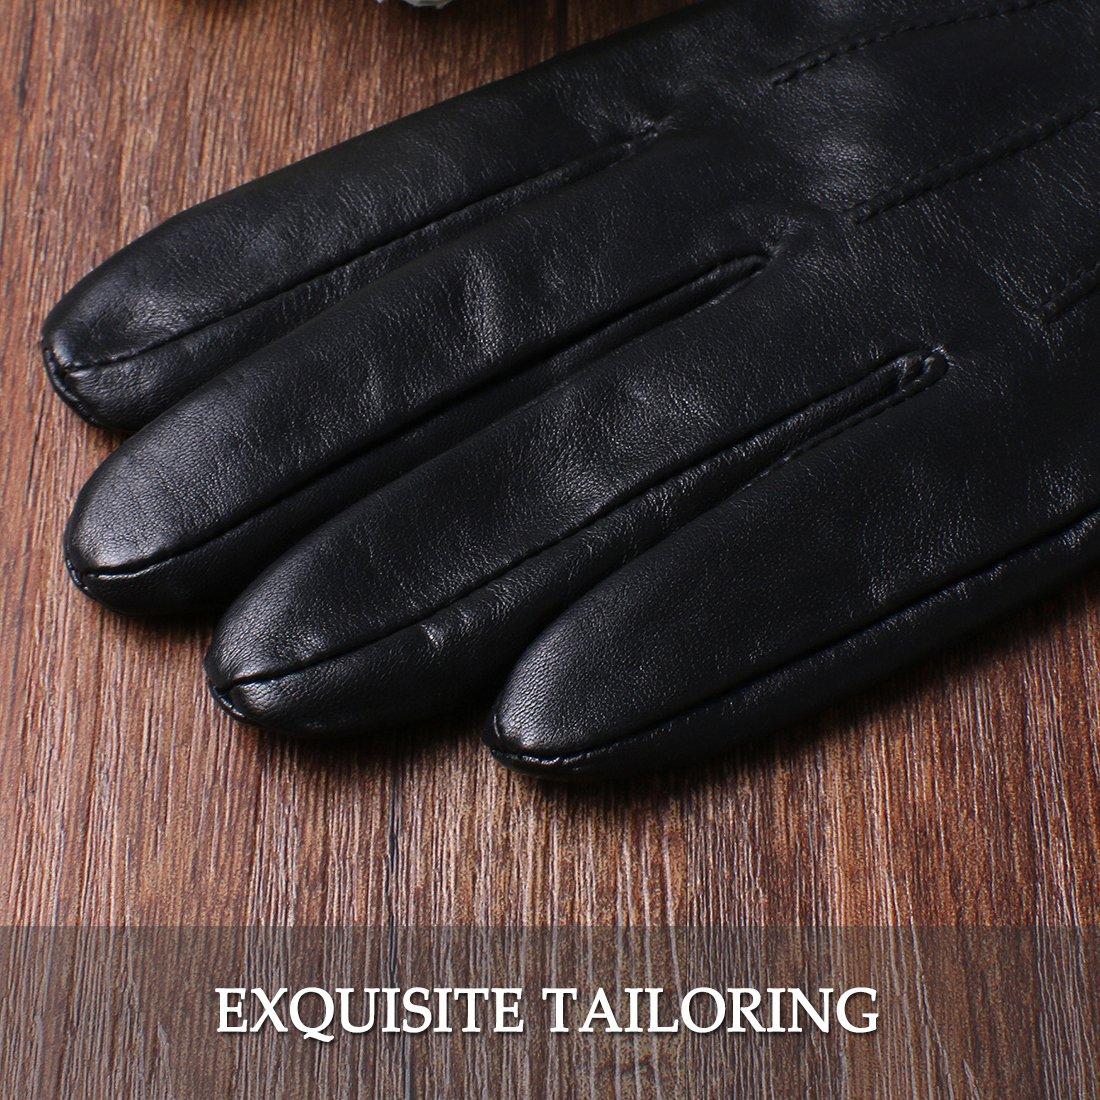 Lambskin Driving Winter Warm Fleece Lining Touchscreen Leather Glove for Men